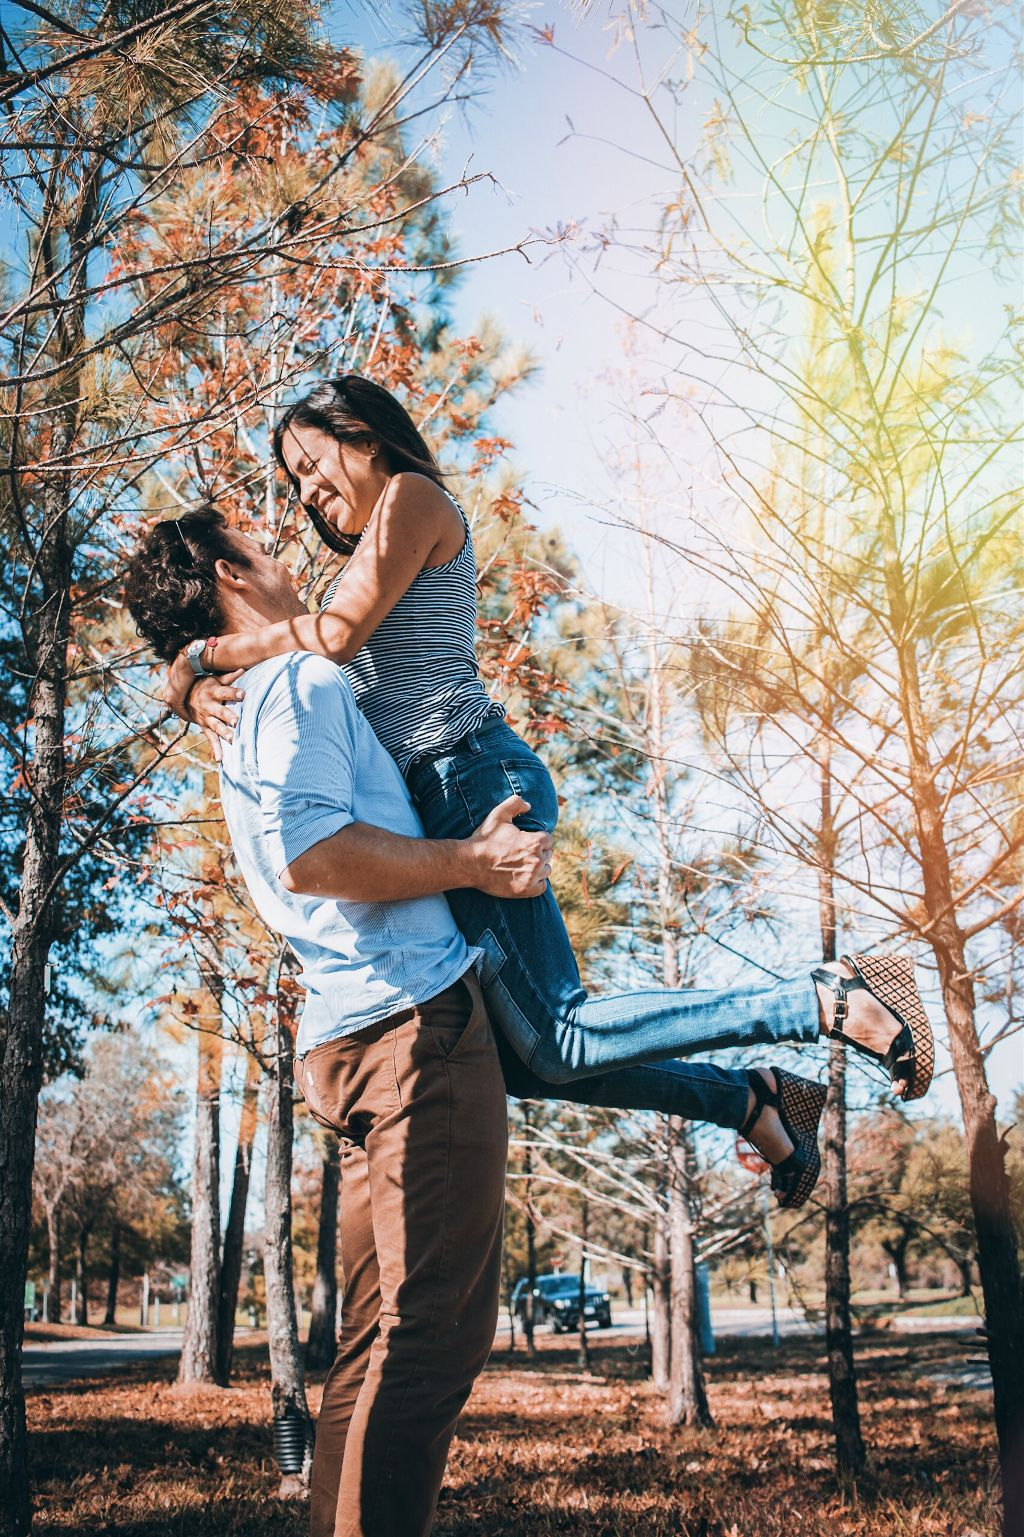 #freetoedit #loveyou #lovestory #lovequotes #lovepulse #lovely